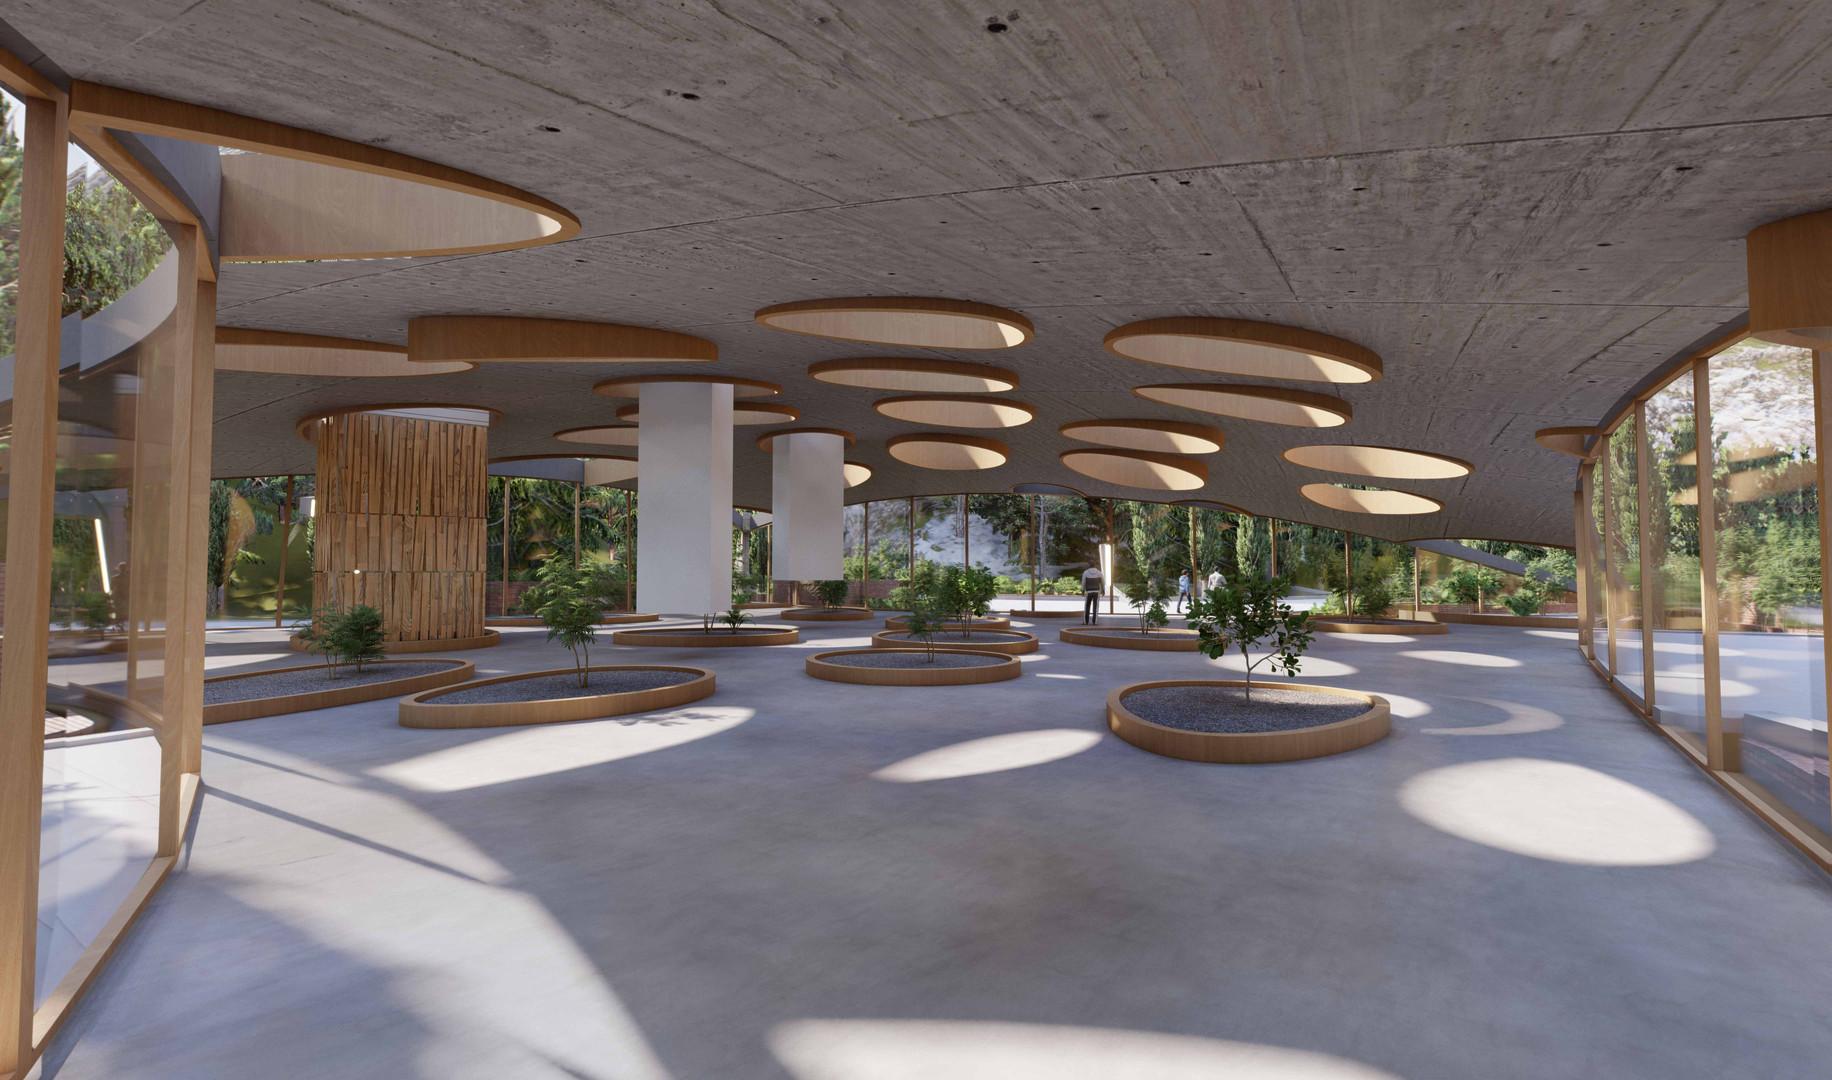 UNESCO_2020_Voronoi Seed Bank_8.jpg